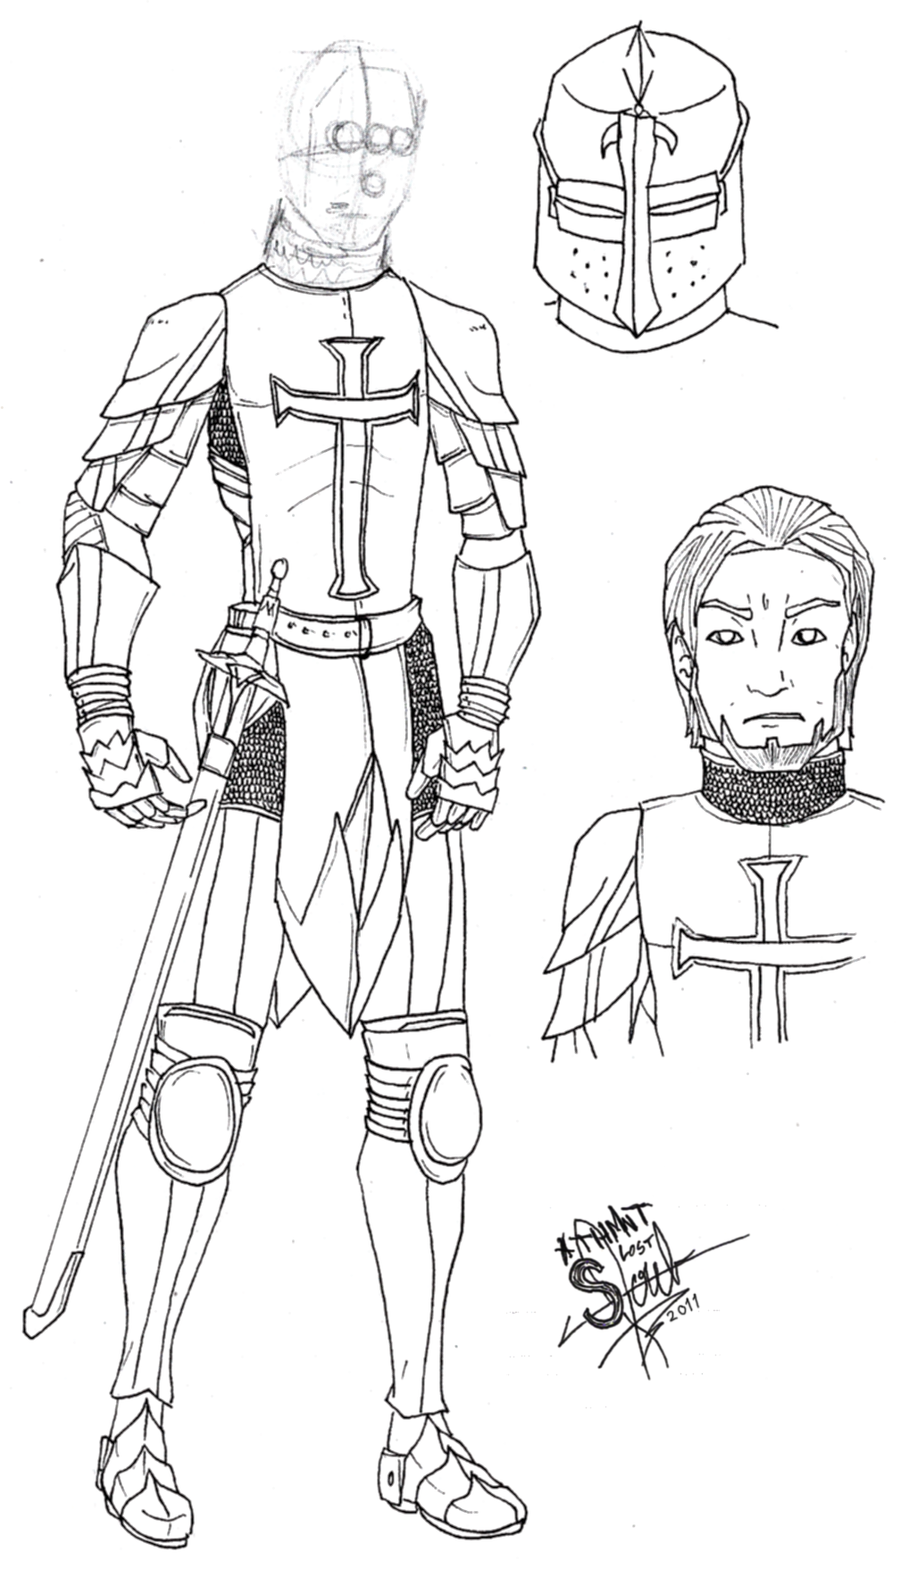 Knight Templar Ivan by athorment on DeviantArt